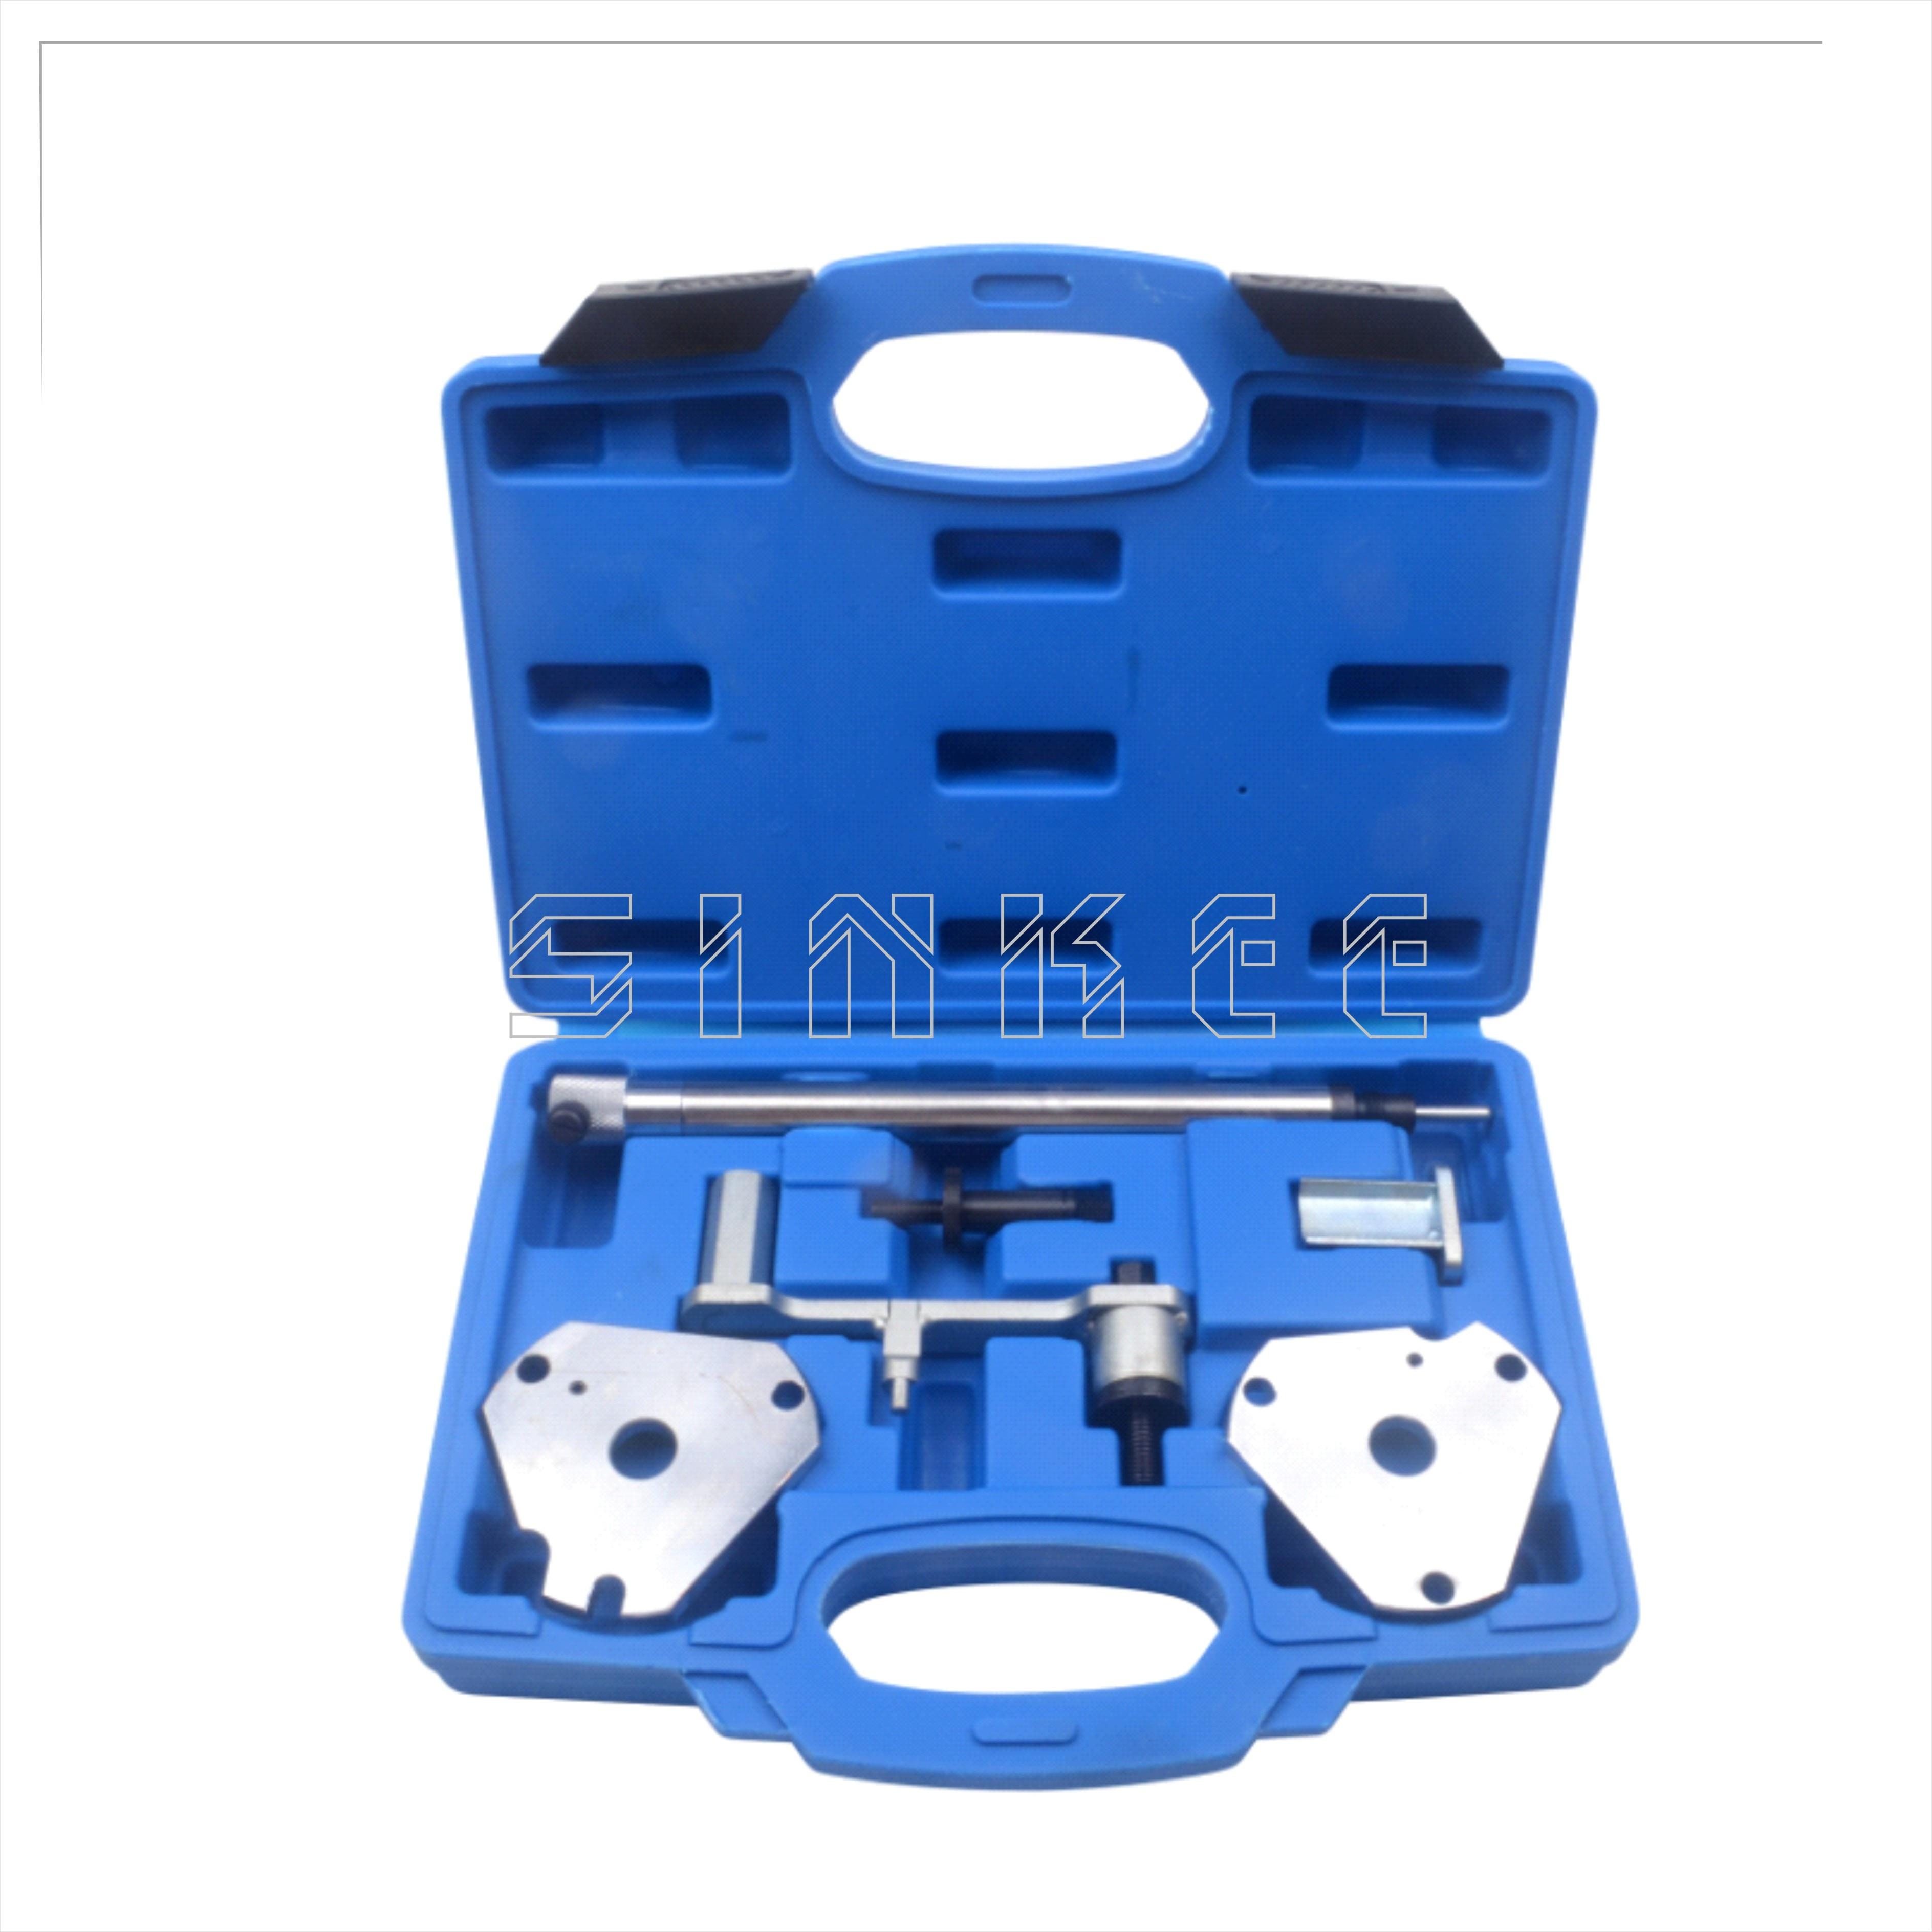 Petrol Engine Twin Cam Camshaft Timing Setting Lock Tool Set For Fiat 1.6 16v petrol engine timing setting locking kit for saab vauxhall opel v6 2 5 2 6 3 0 3 2